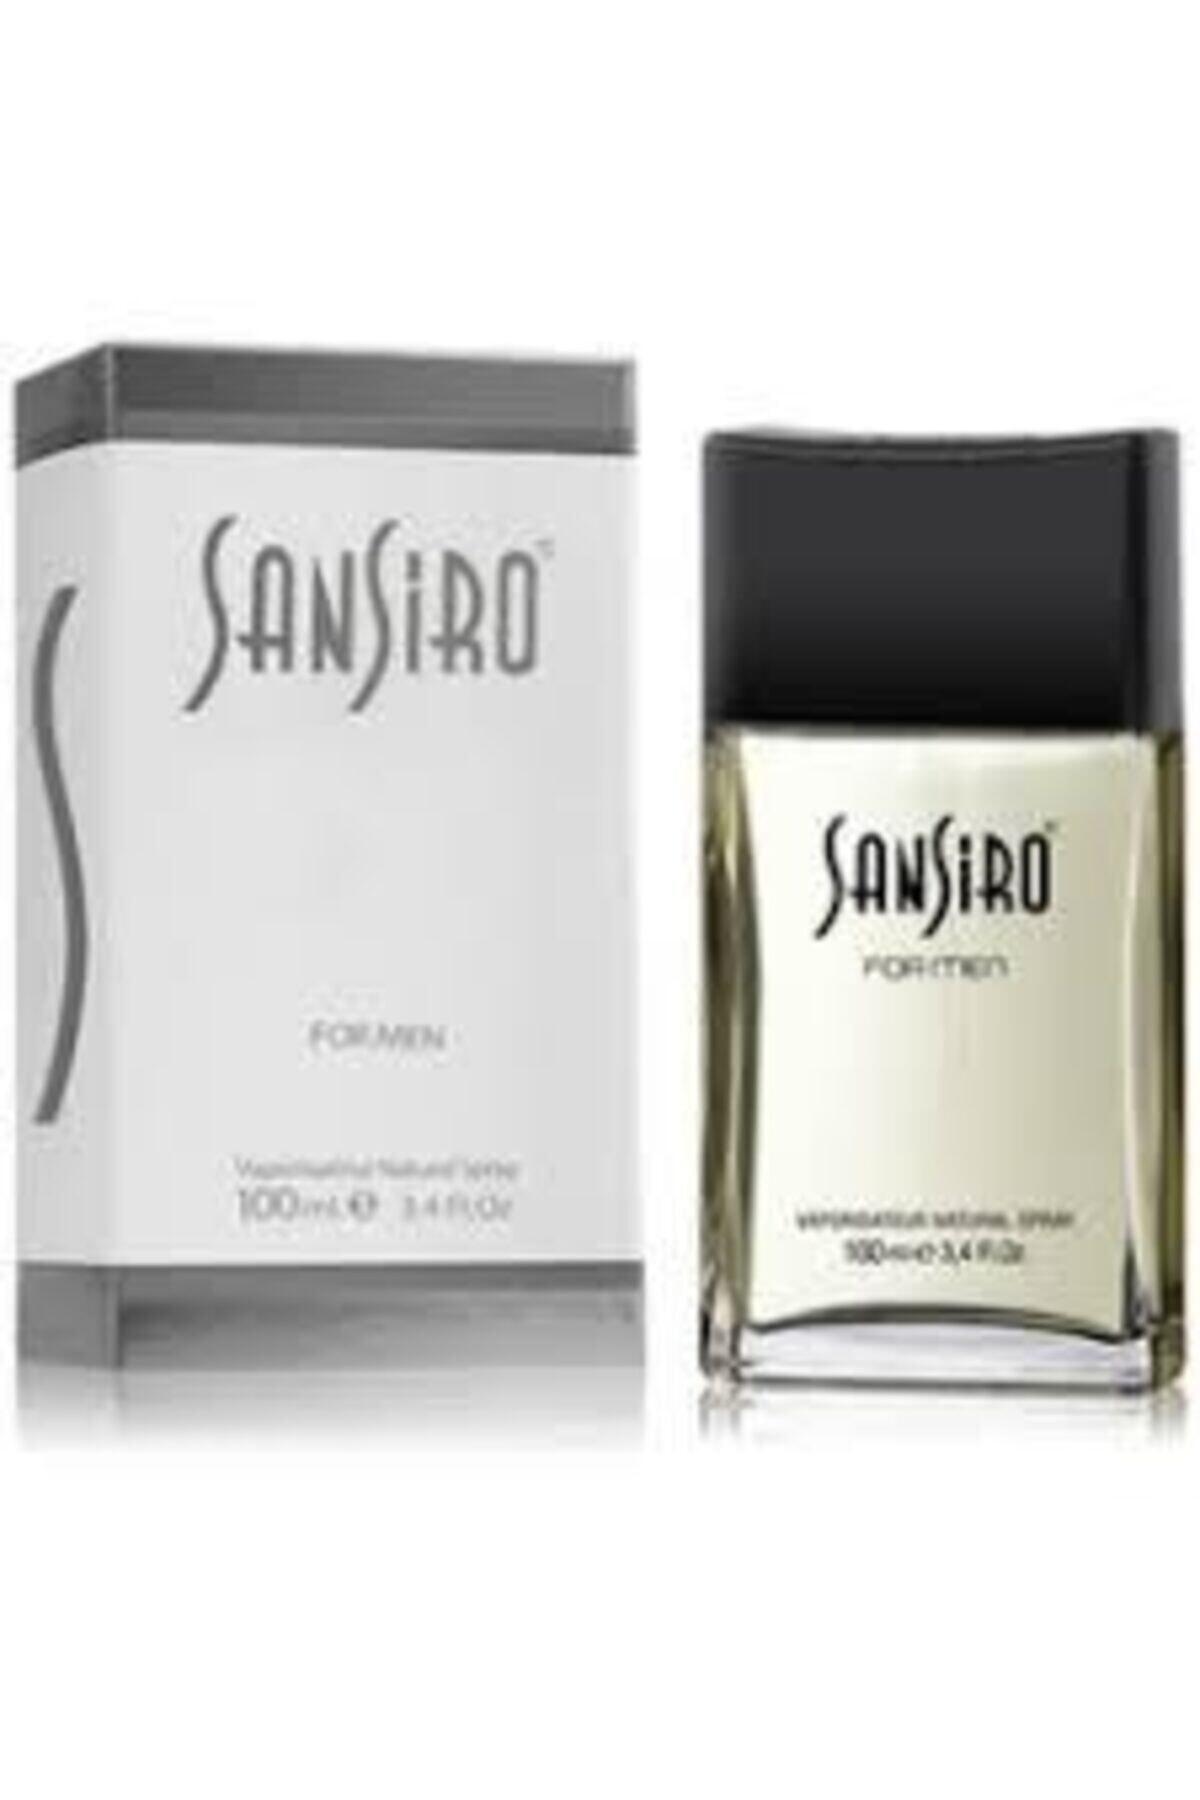 Sansiro Erkek Parfüm 100 ml E-6 1